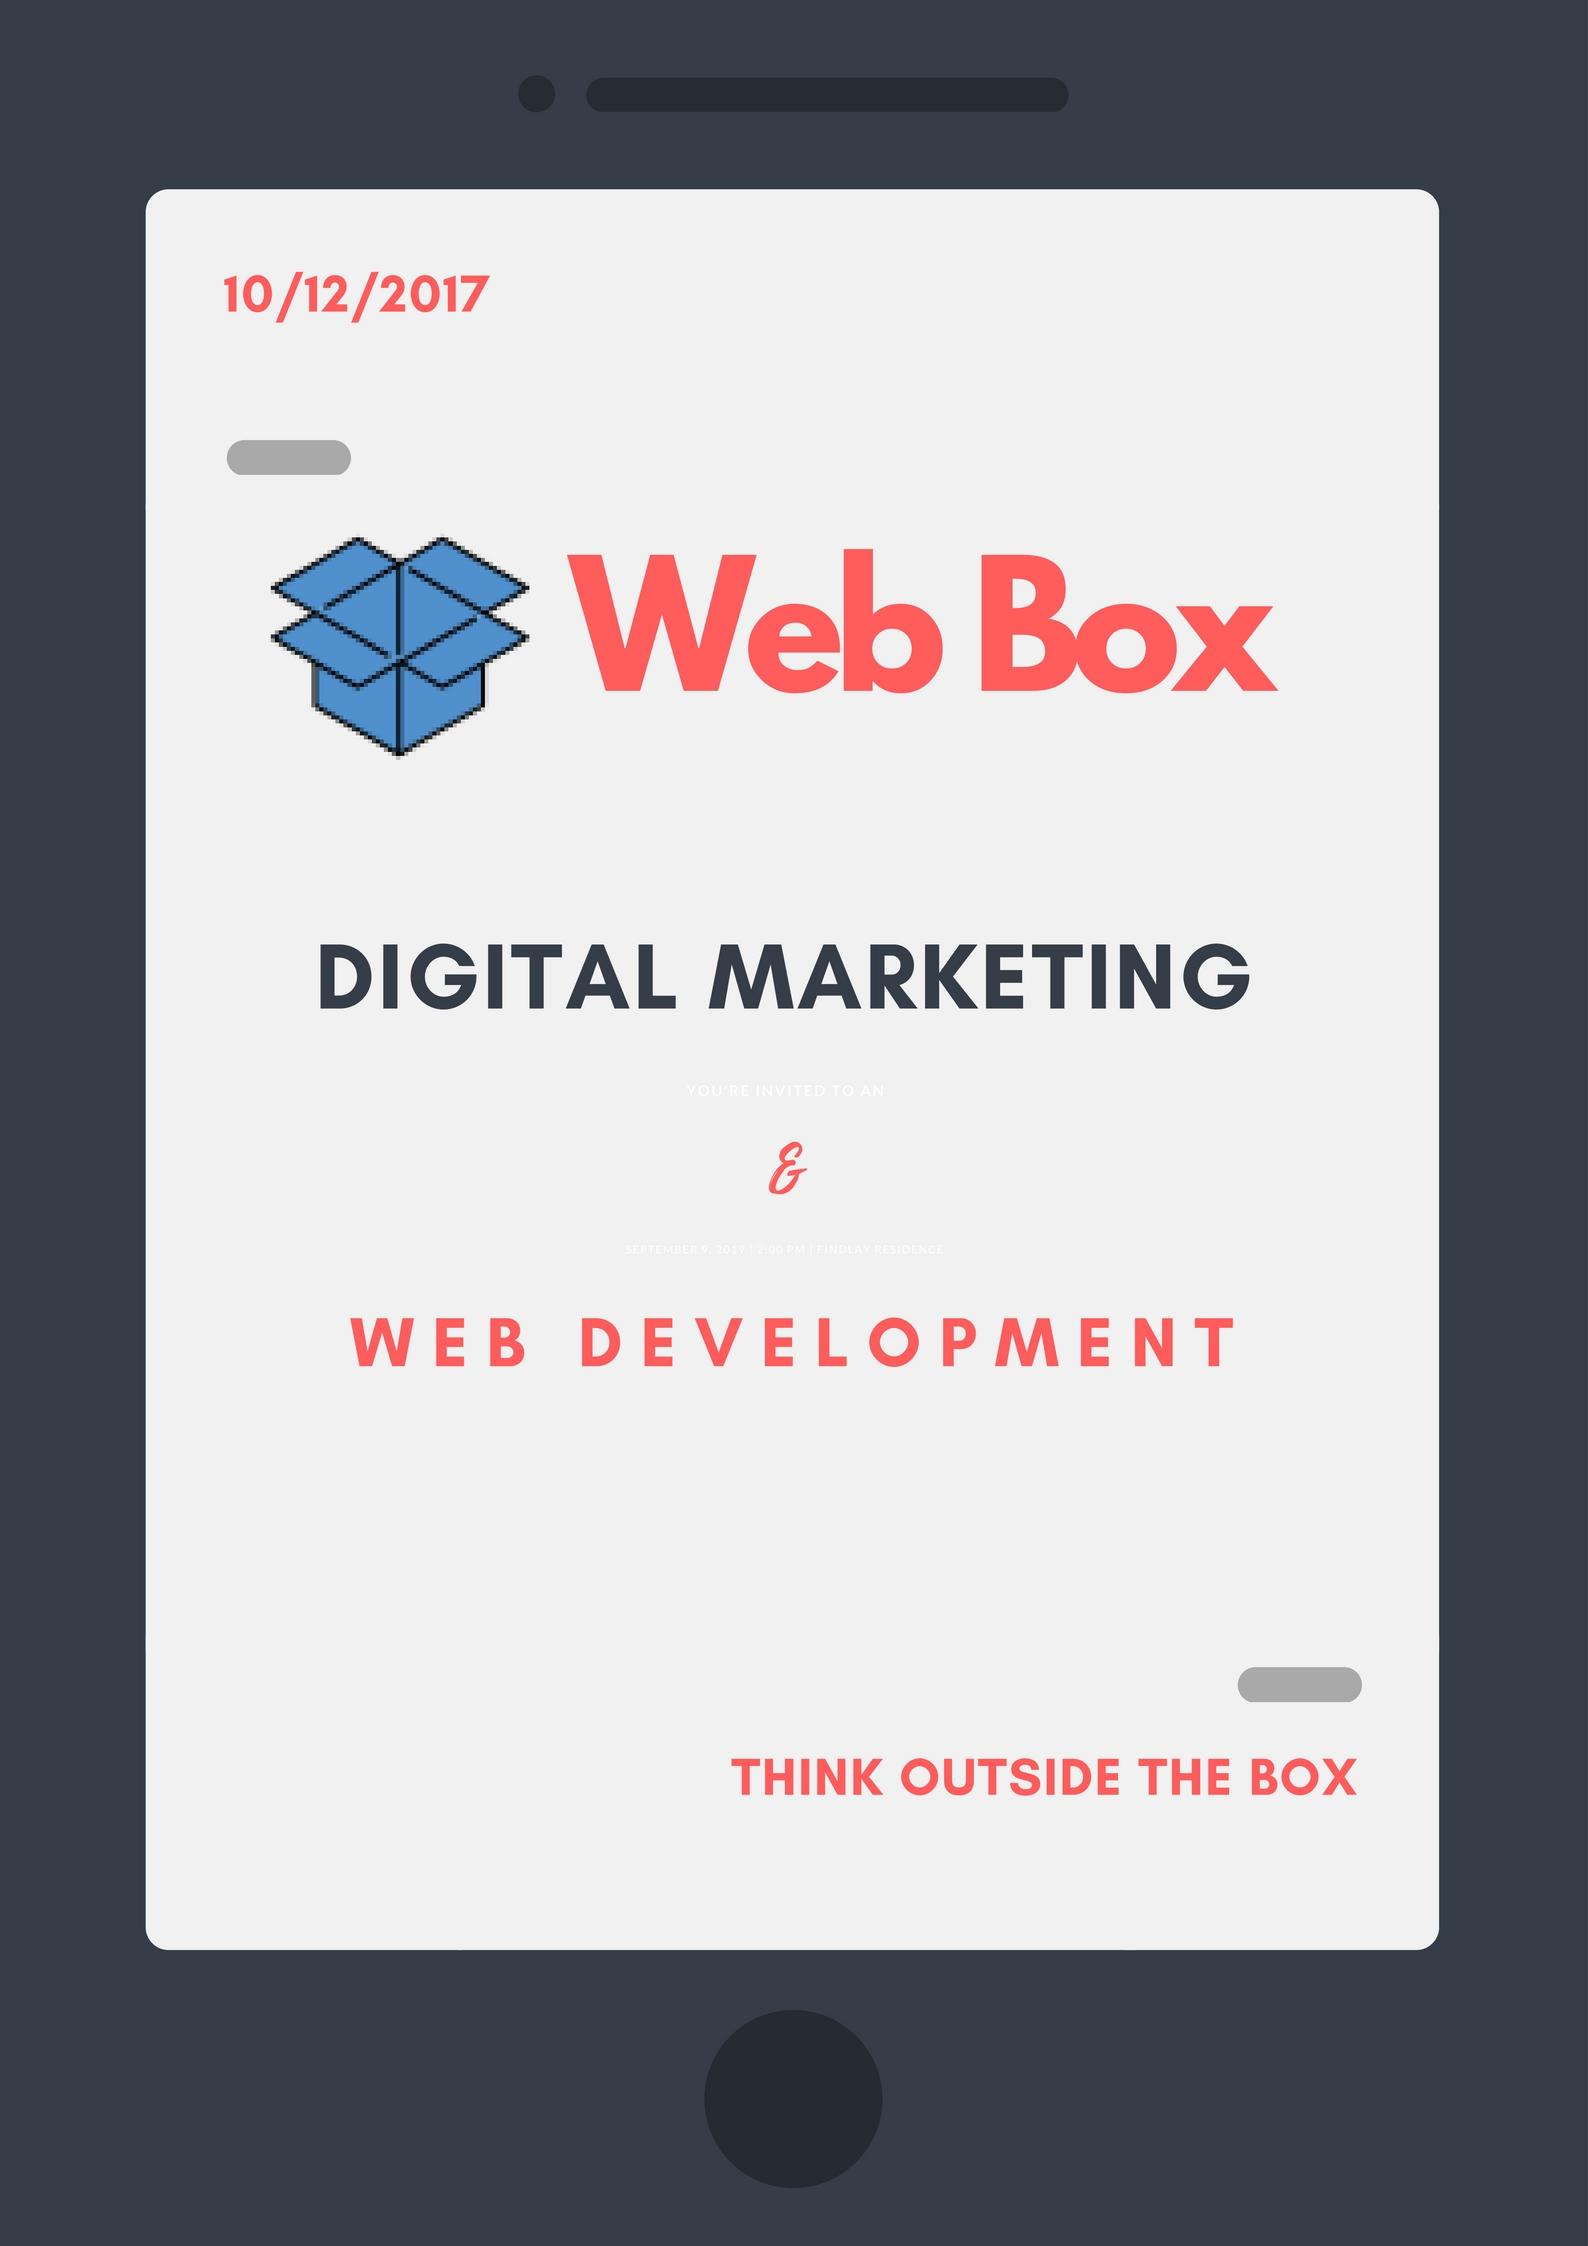 Web Box